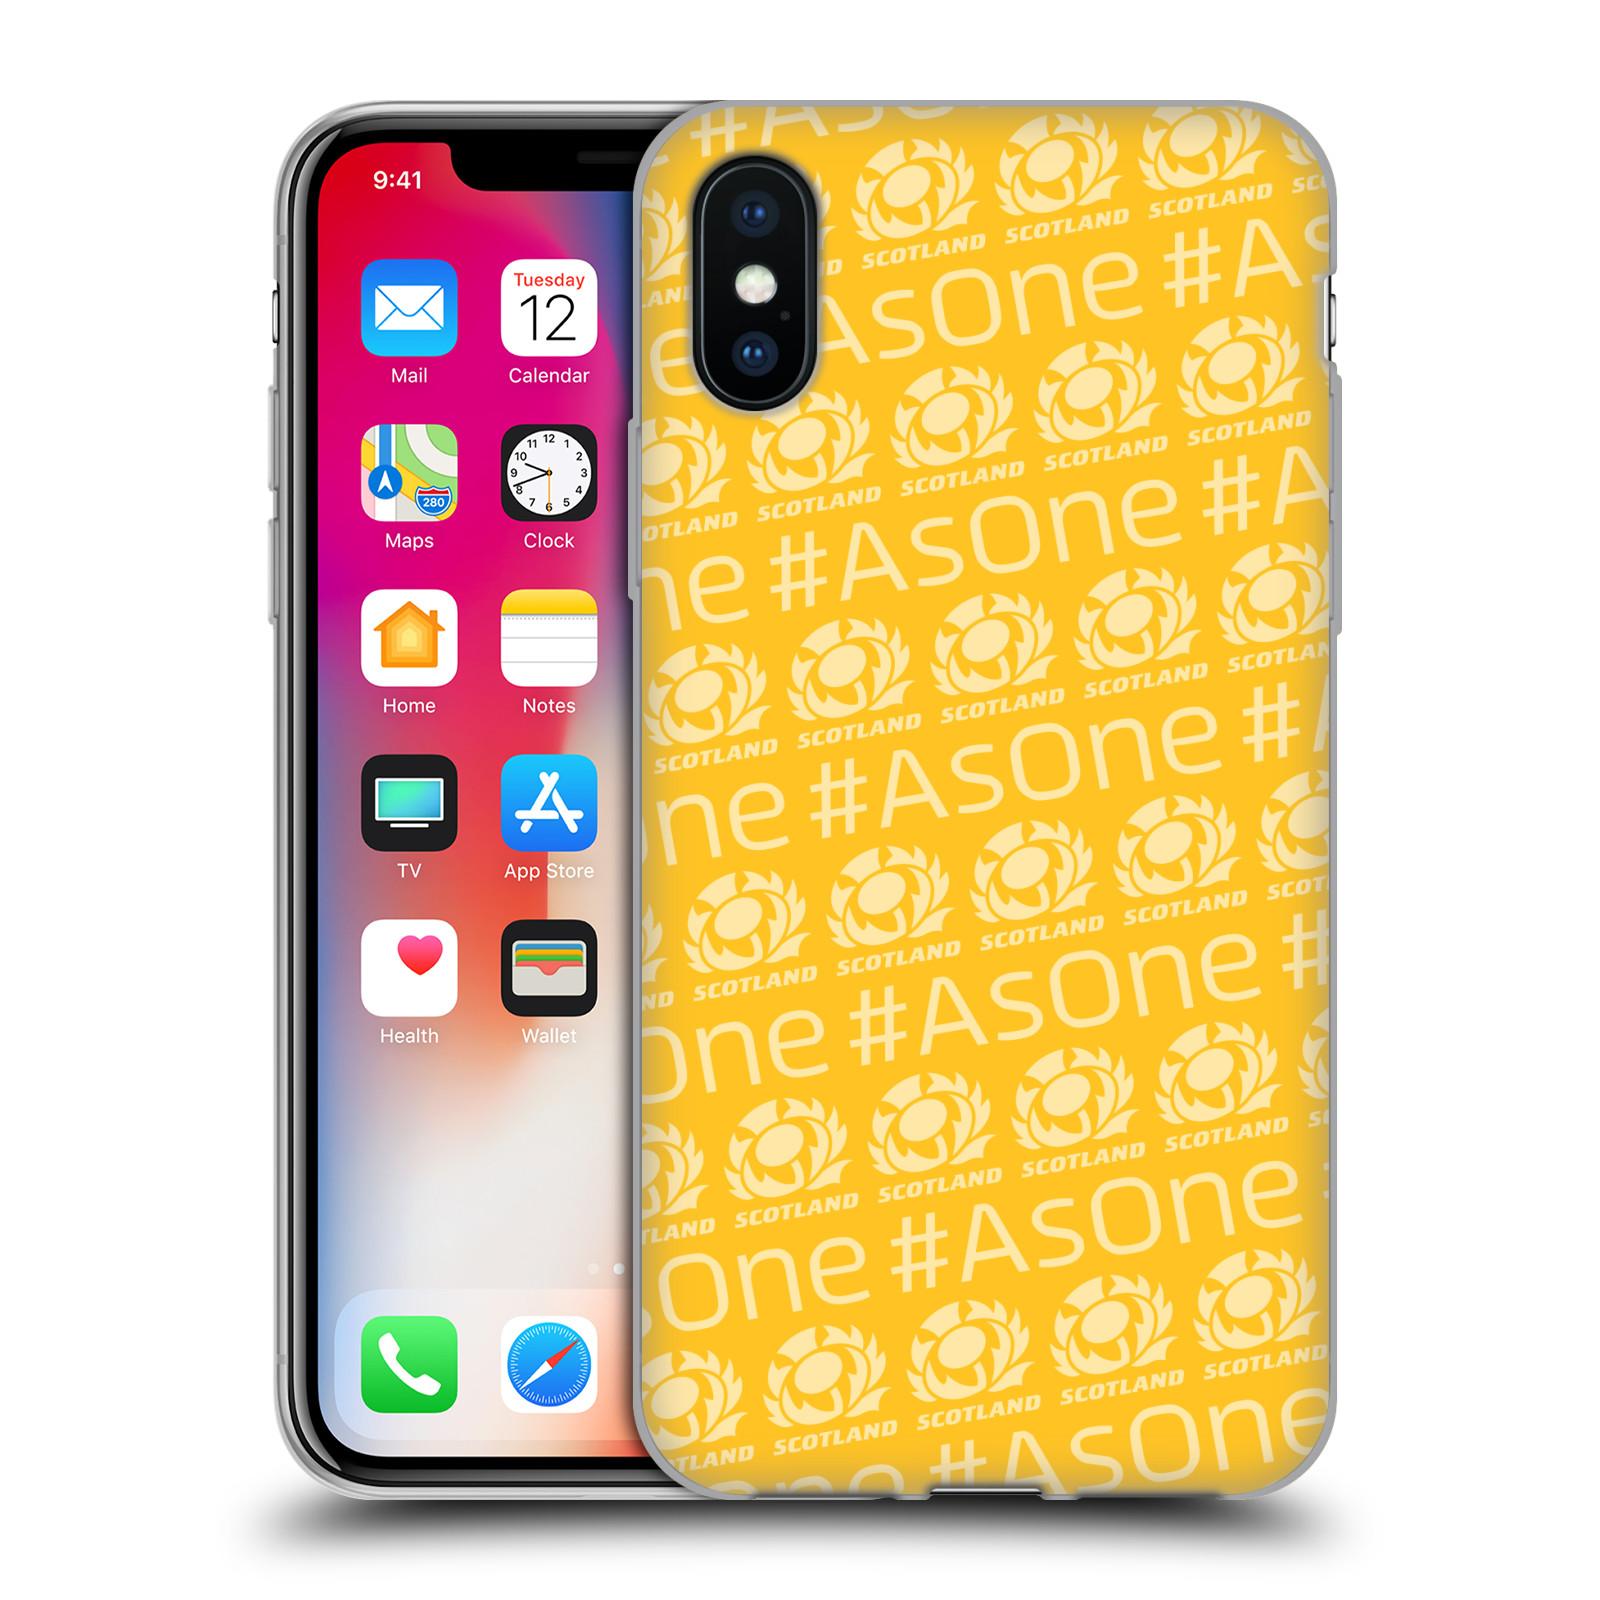 UFFICIALE-SCOTLAND-RUGBY-2018-19-AS-ONE-CASE-IN-GEL-PER-APPLE-iPHONE-TELEFONI